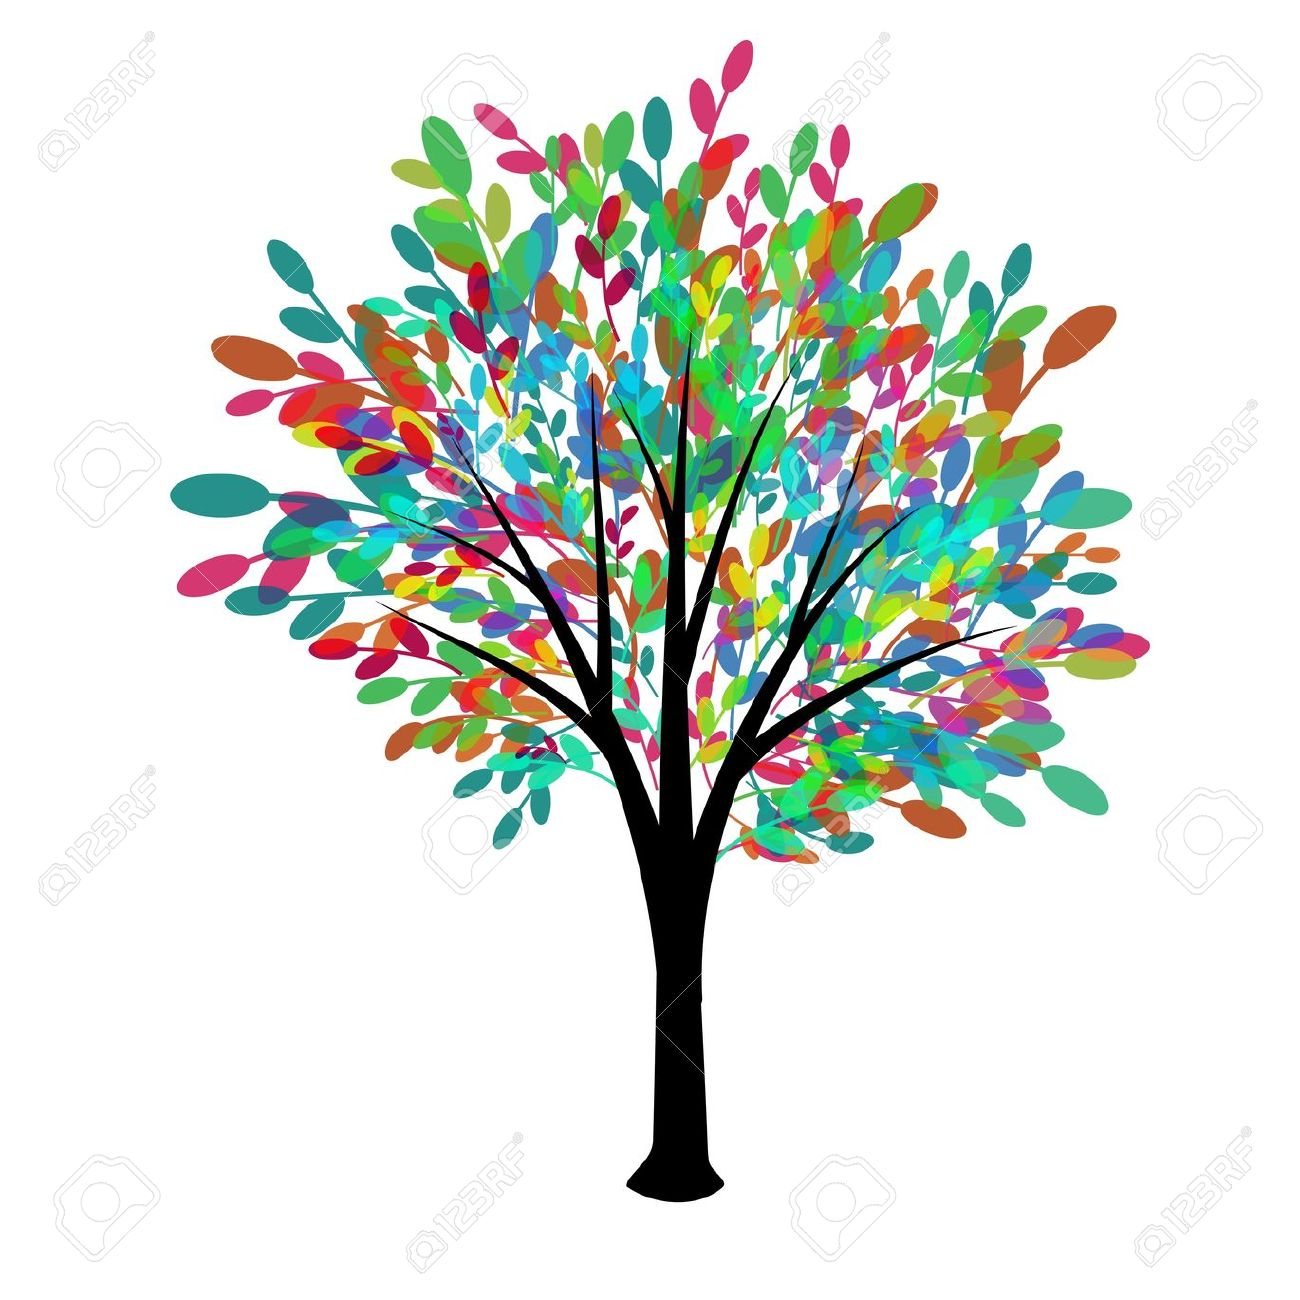 Tree of Life Clip Art.